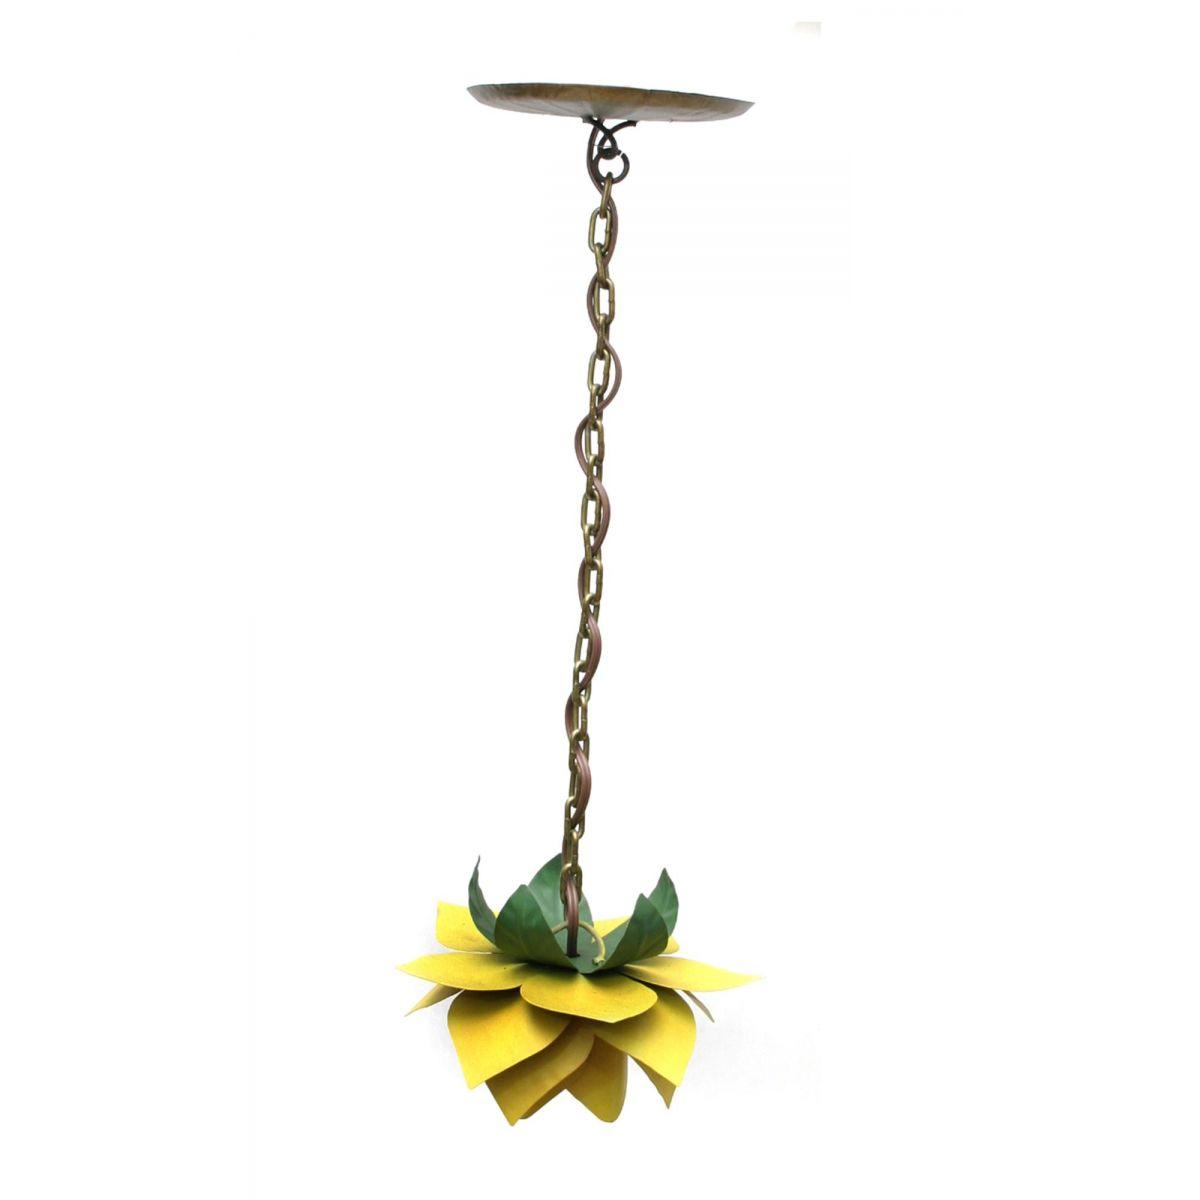 Luminaria Para Quarto de Ferro Artesanal Rustica Decorativa Flor